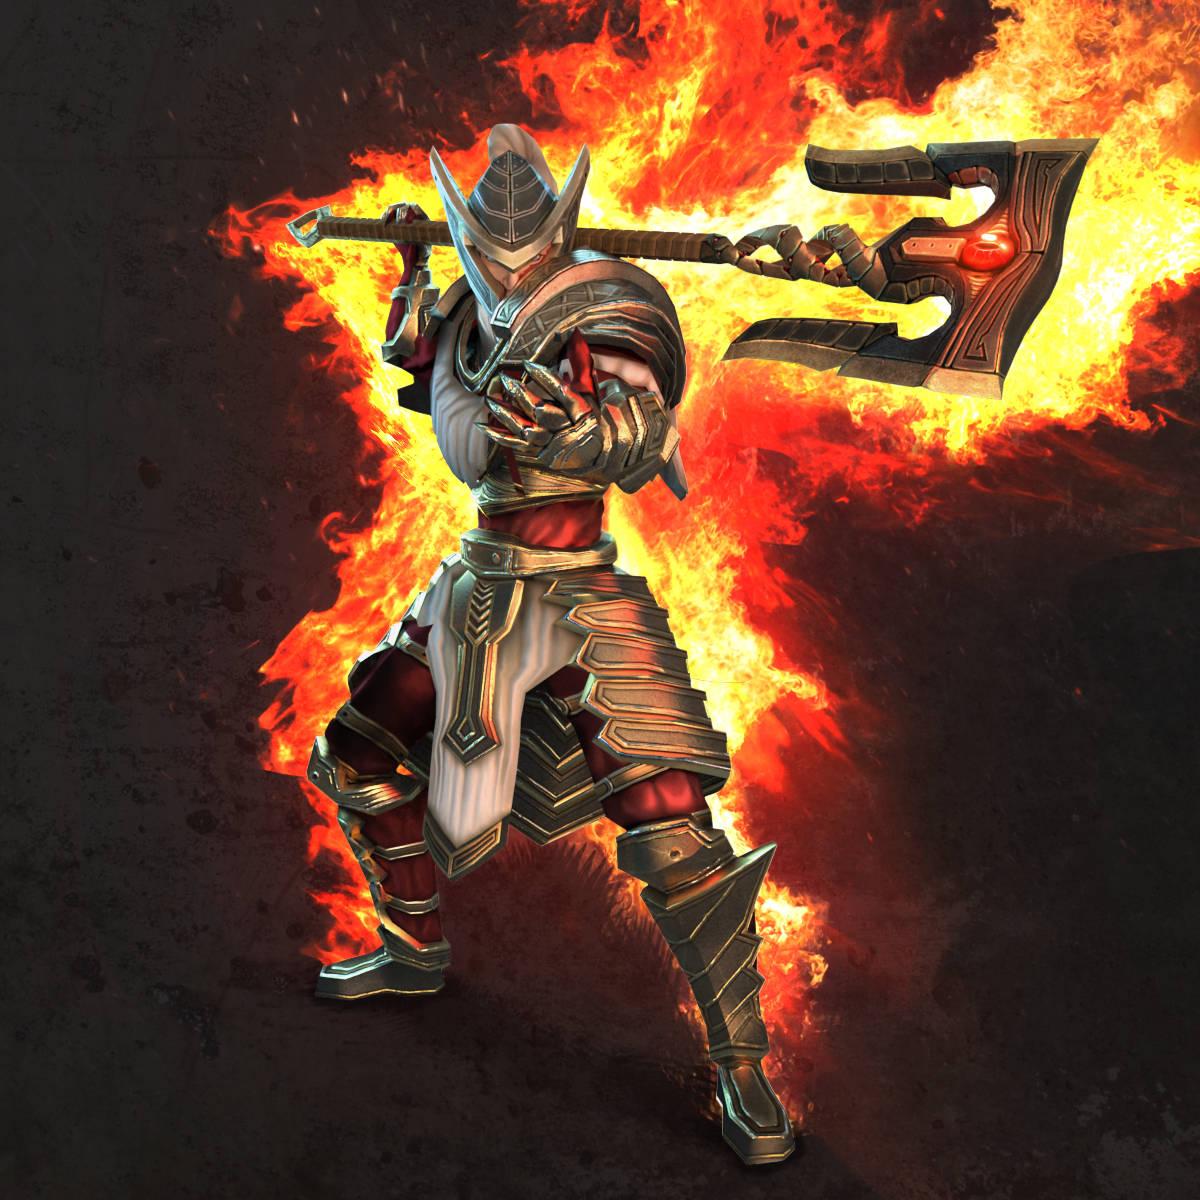 kyn_classic_rpg_legendary_fire_master_set